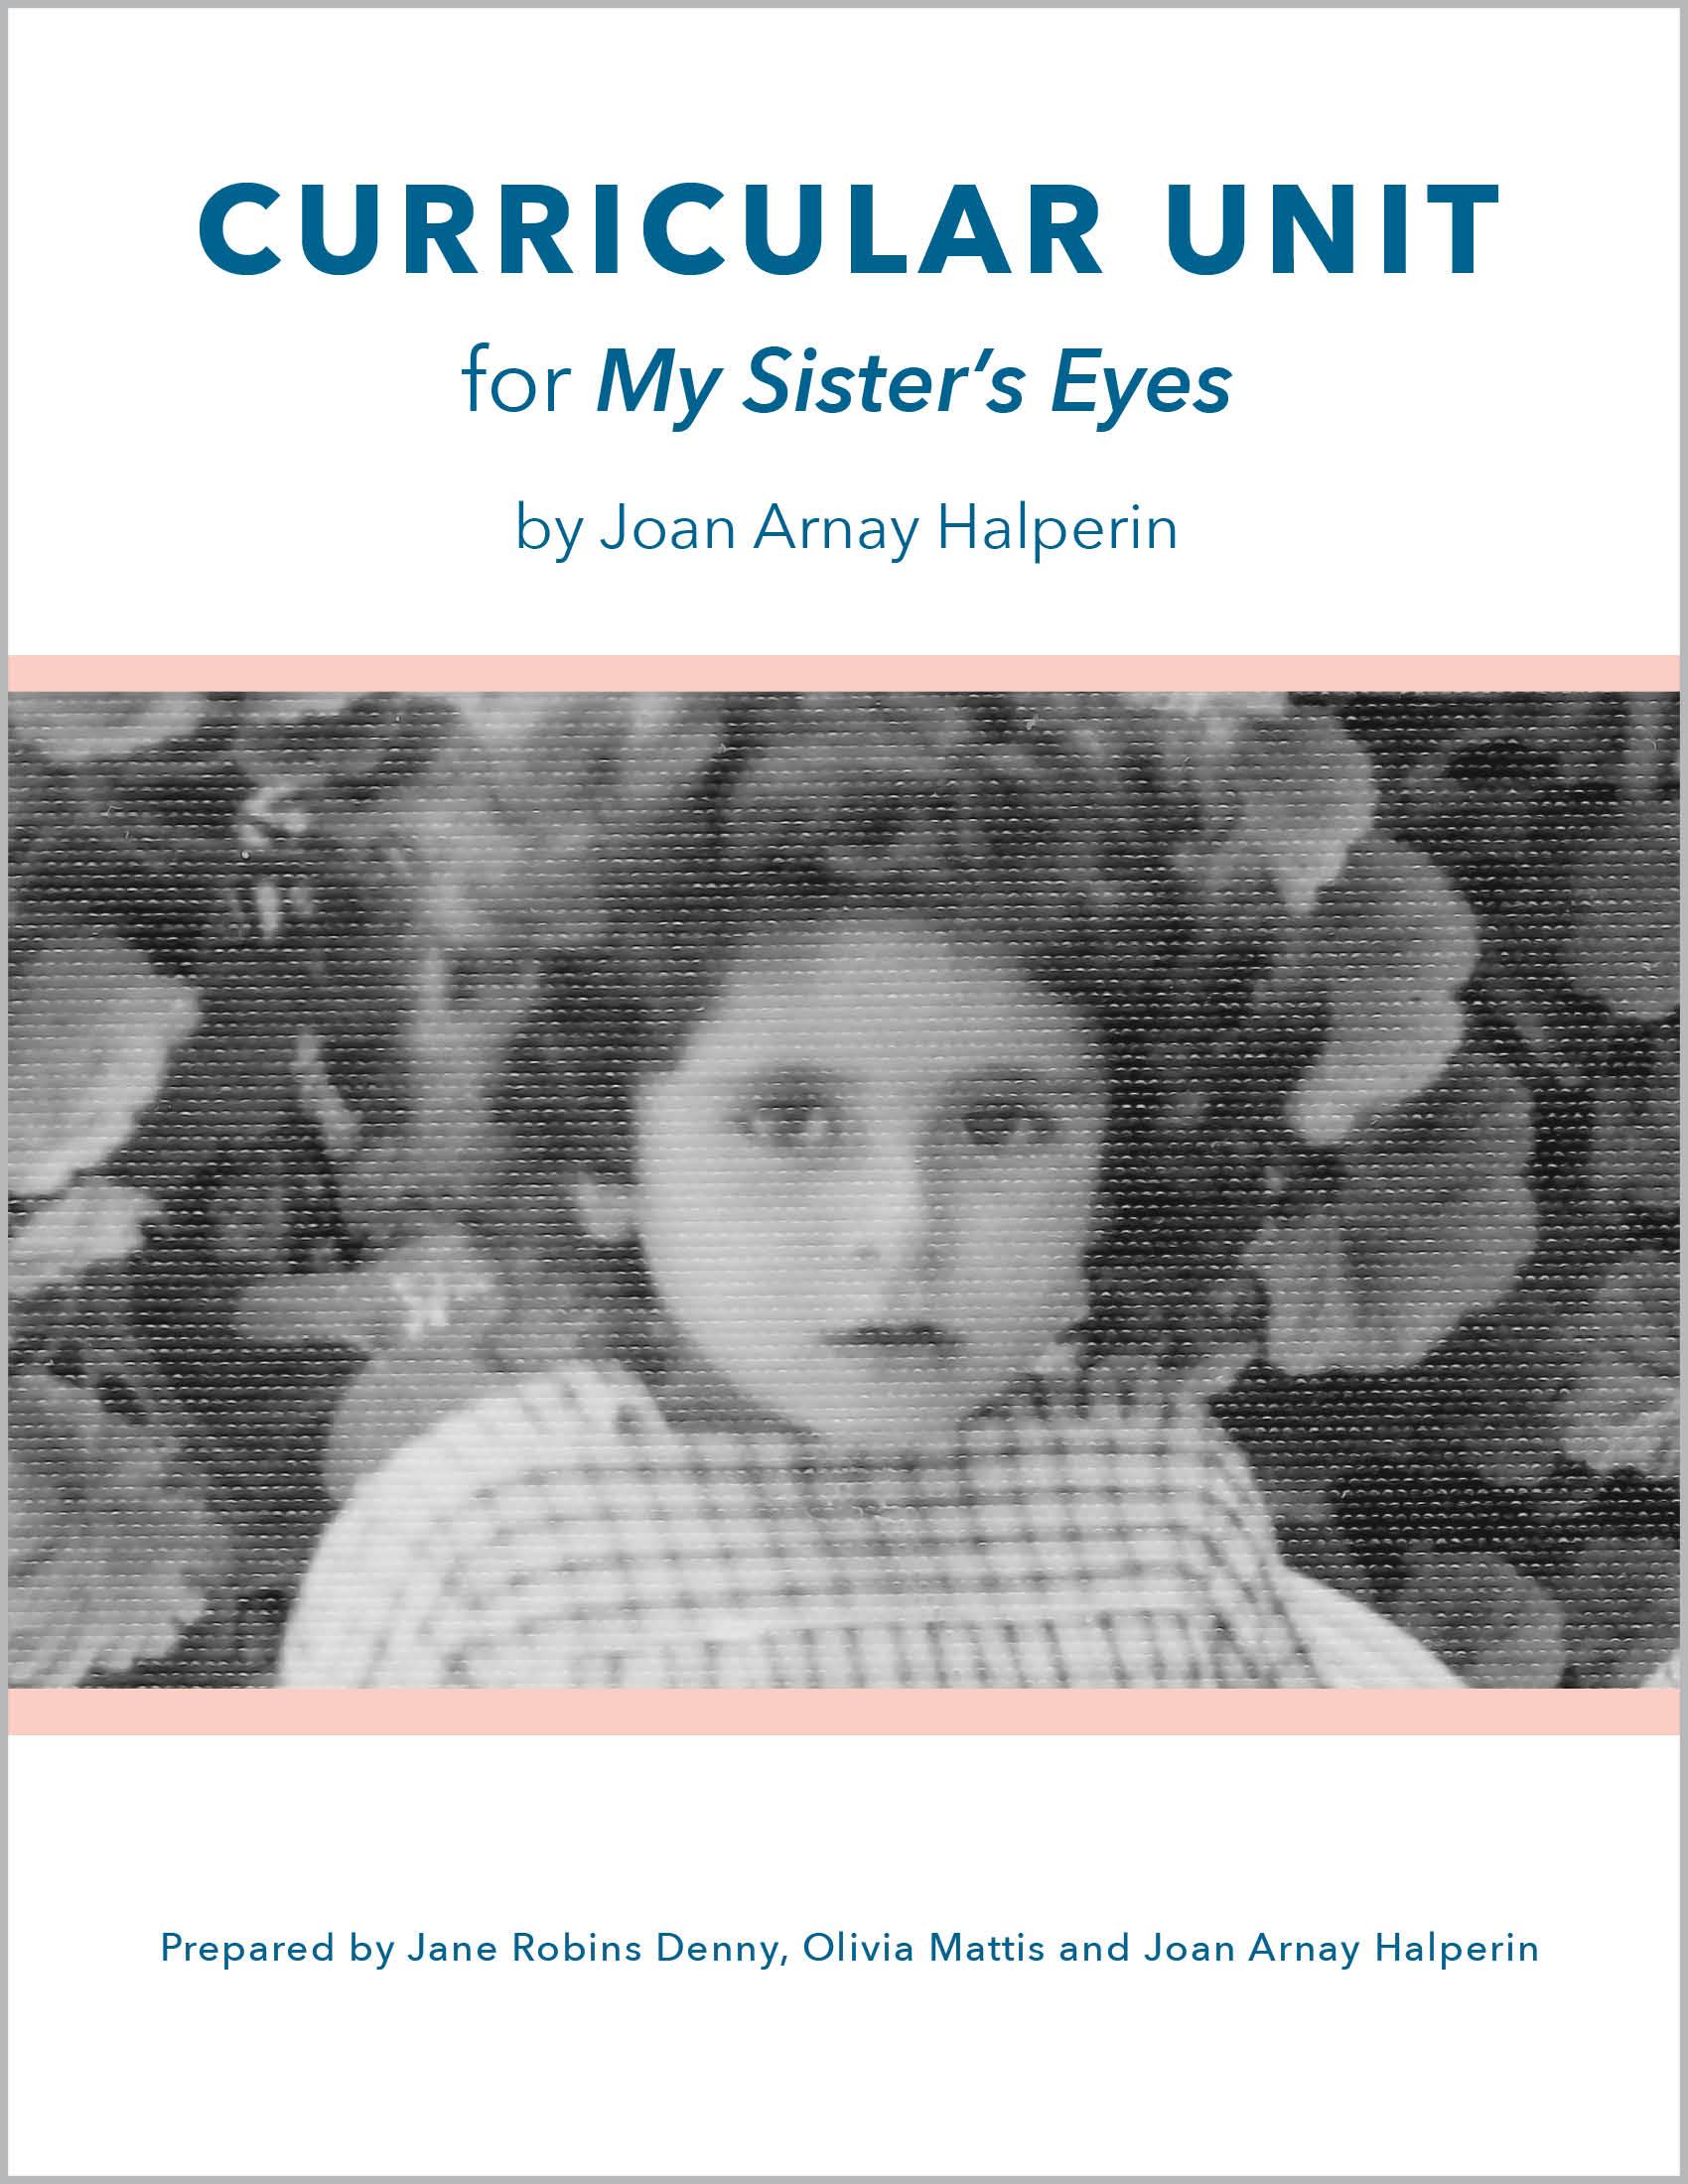 curricular unit_my sisters eyes_cover.jpg